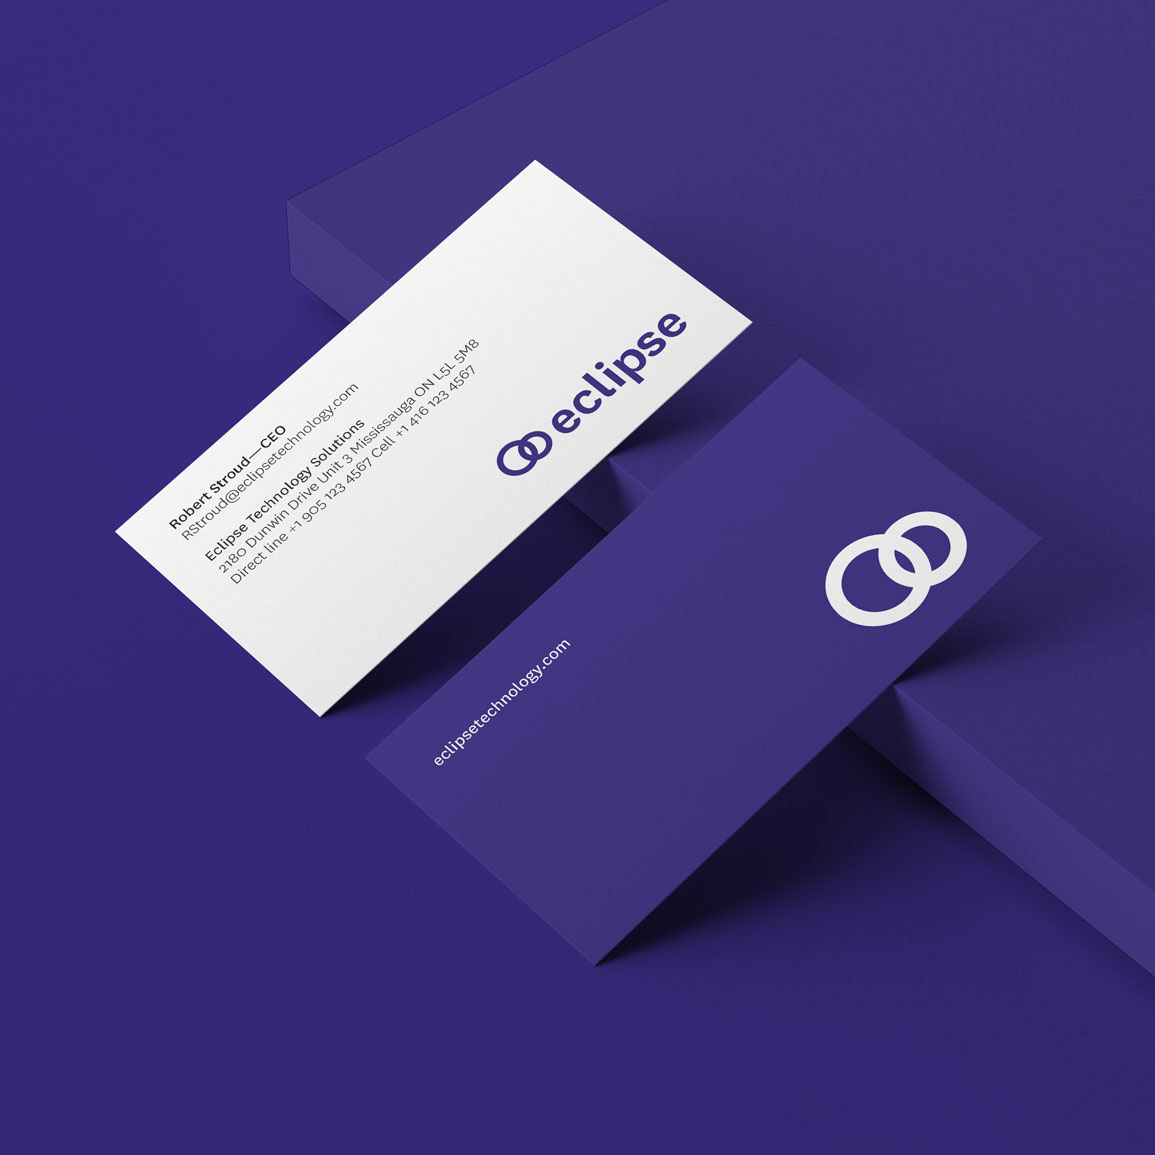 Eclipse Technology business card design